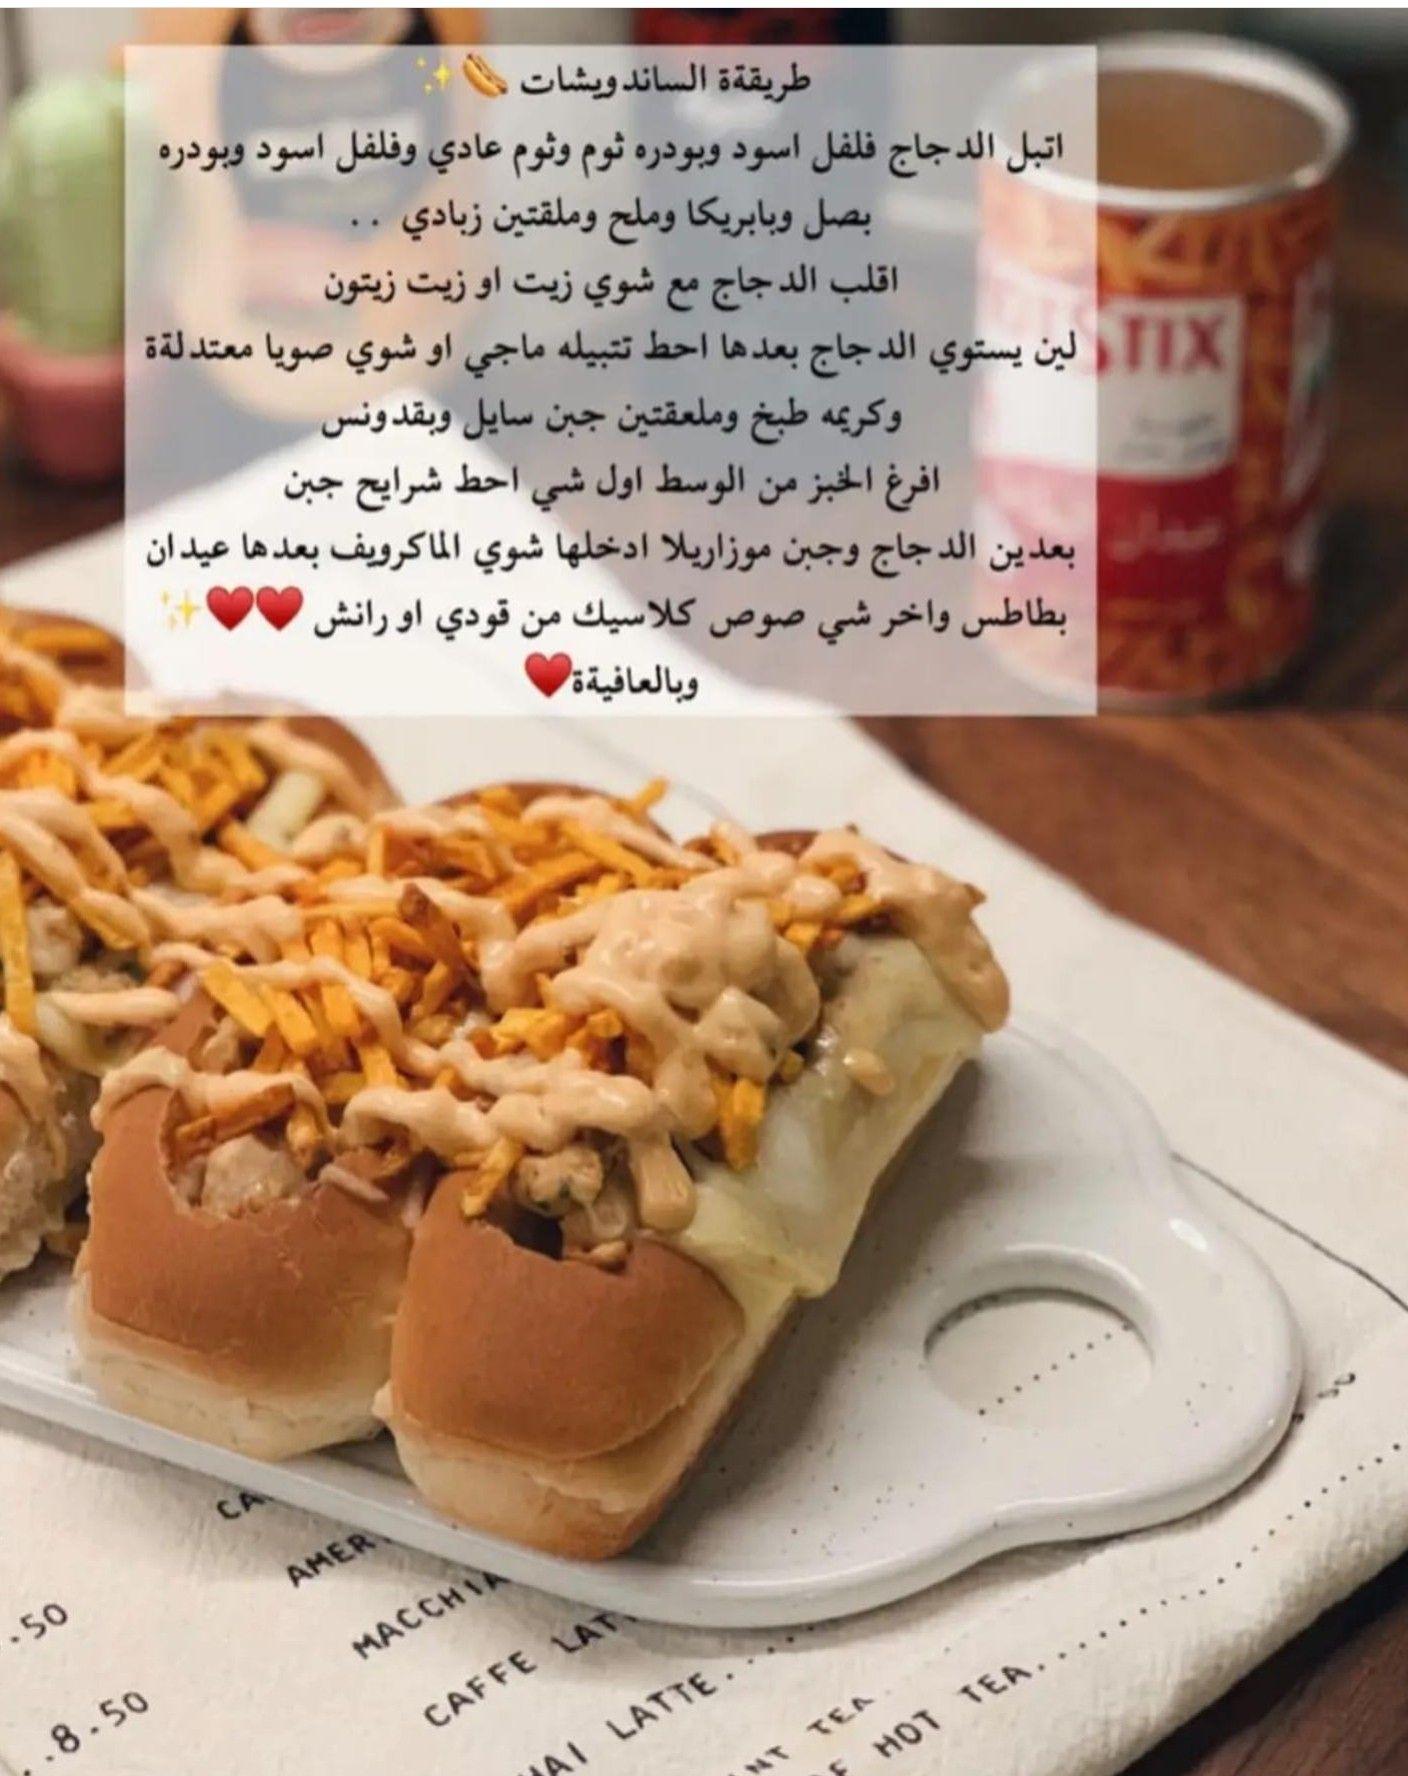 Pin By Asma On طبخات Arabian Food Kitchen Recipes Food